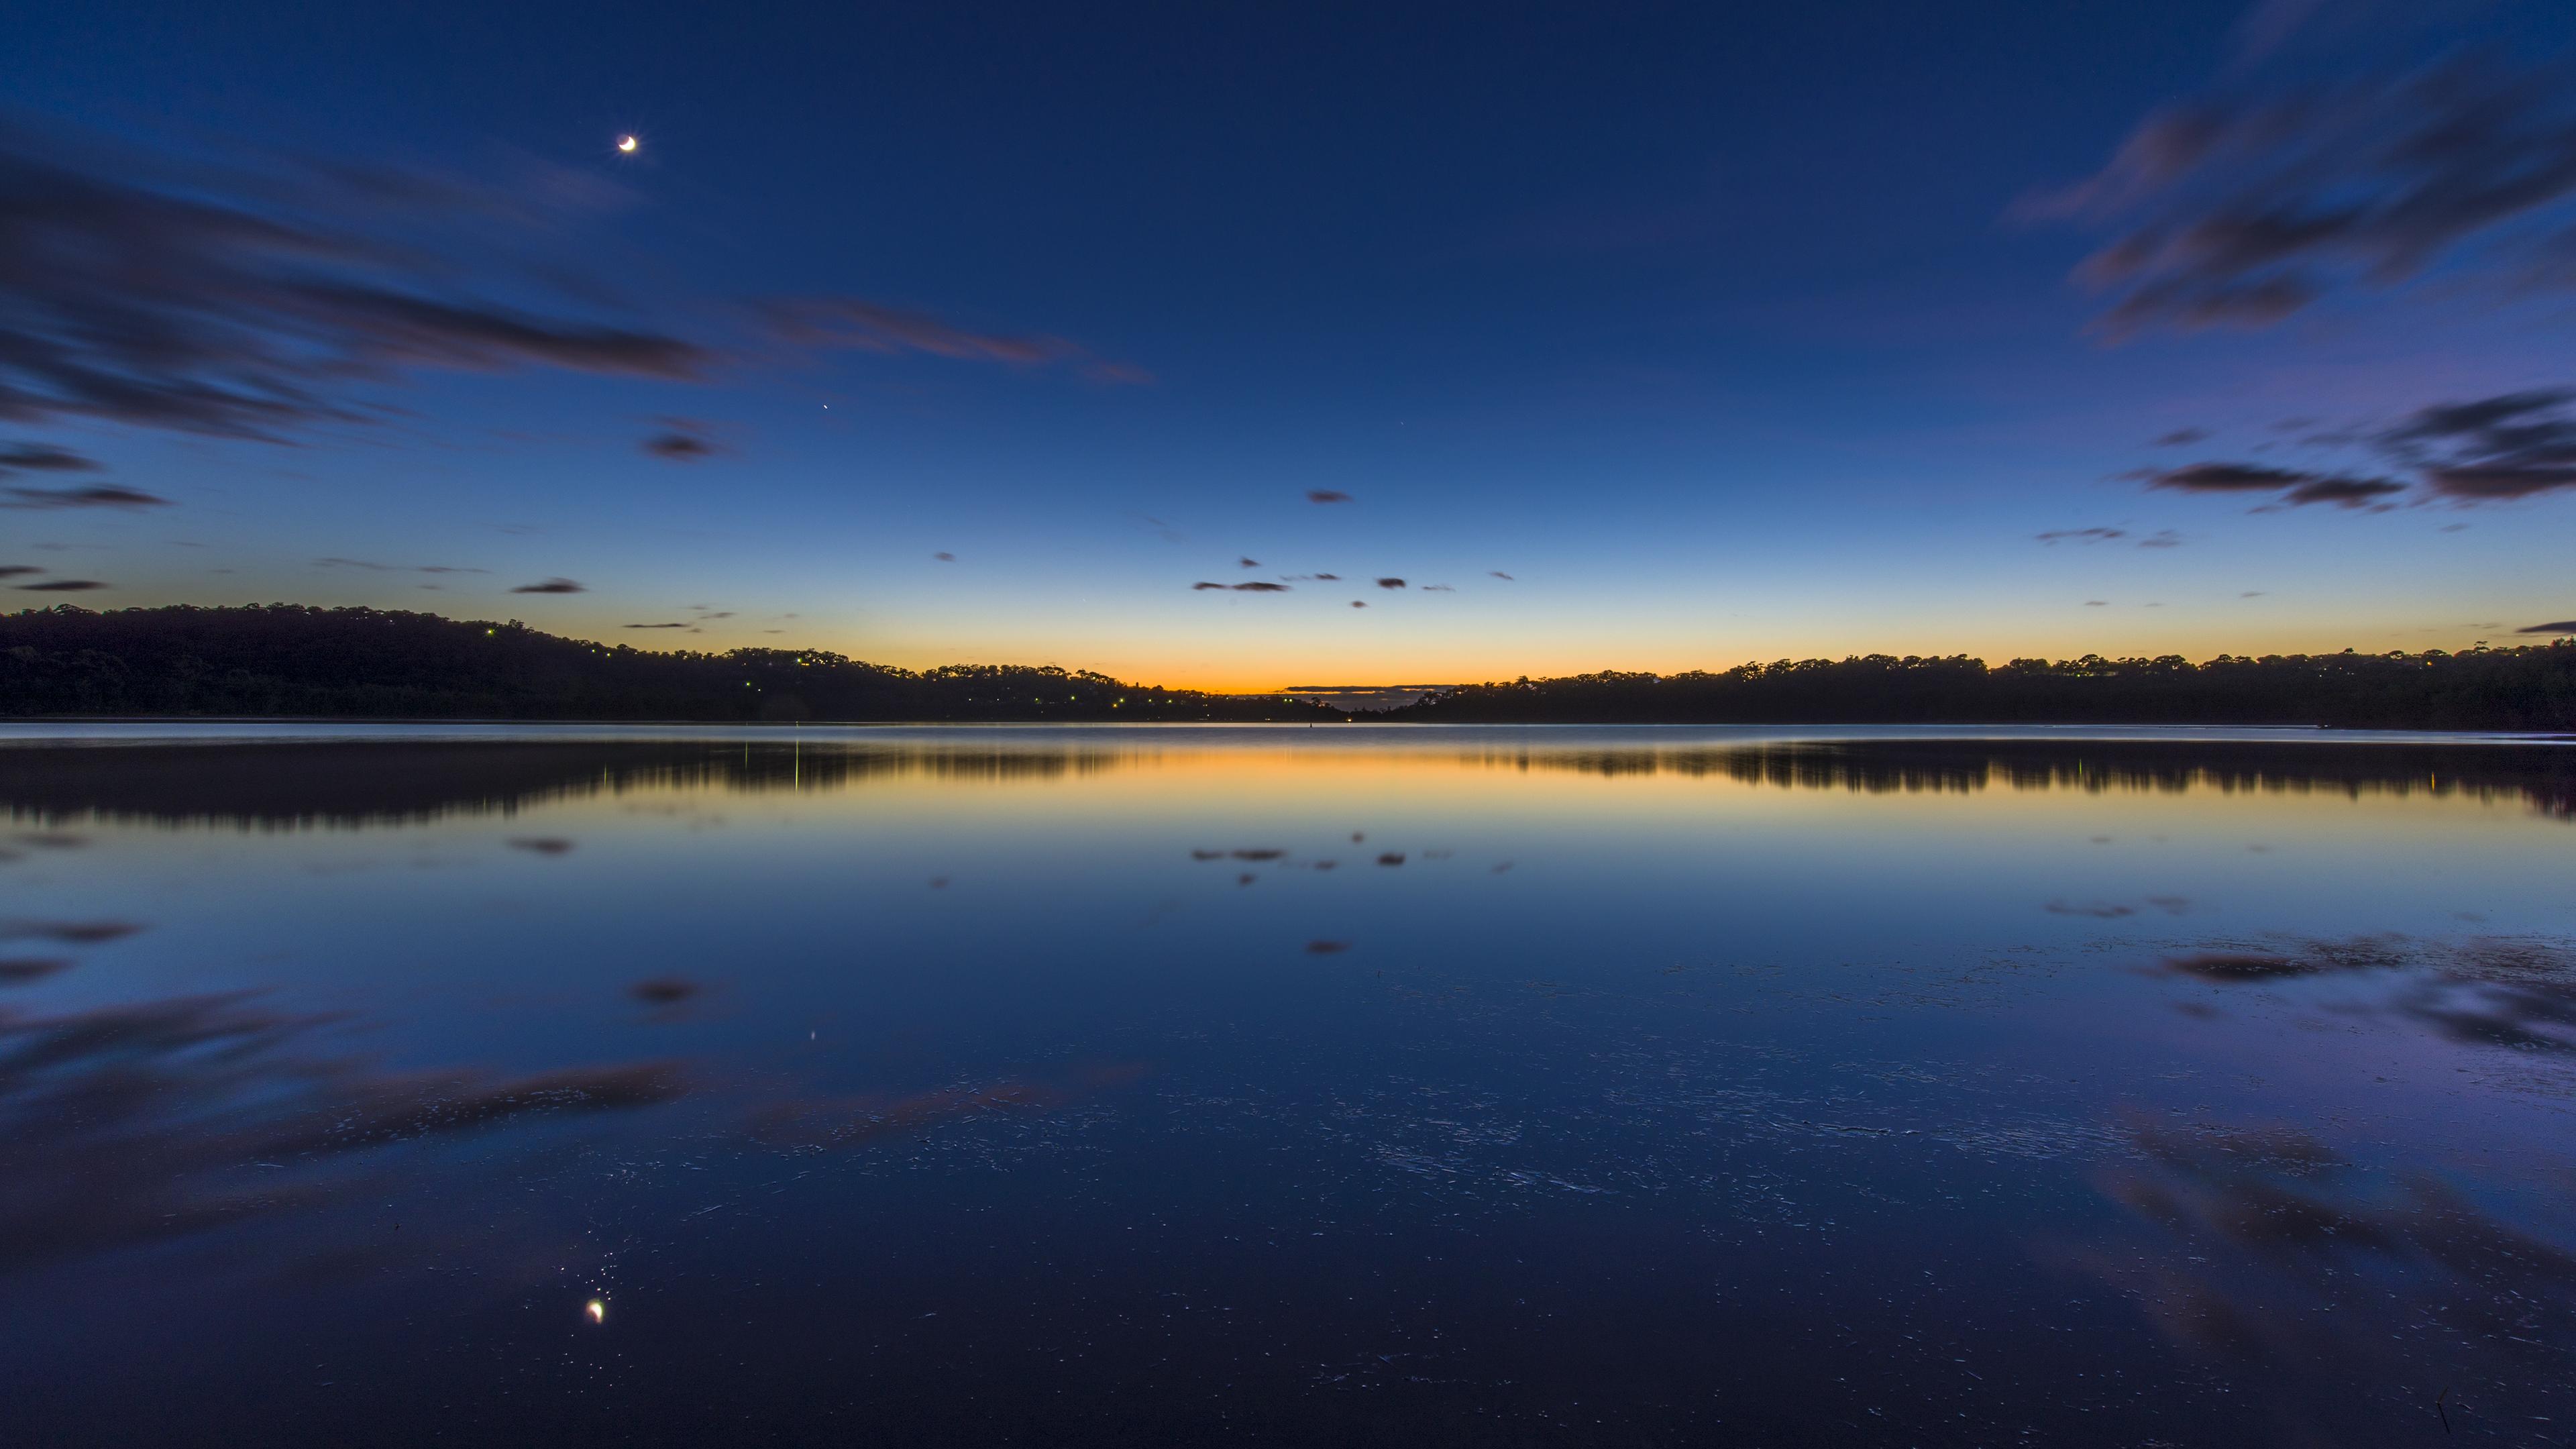 nature lake sunset landscape ultrahd 4k wallpaper wallpaper background 3840x2160